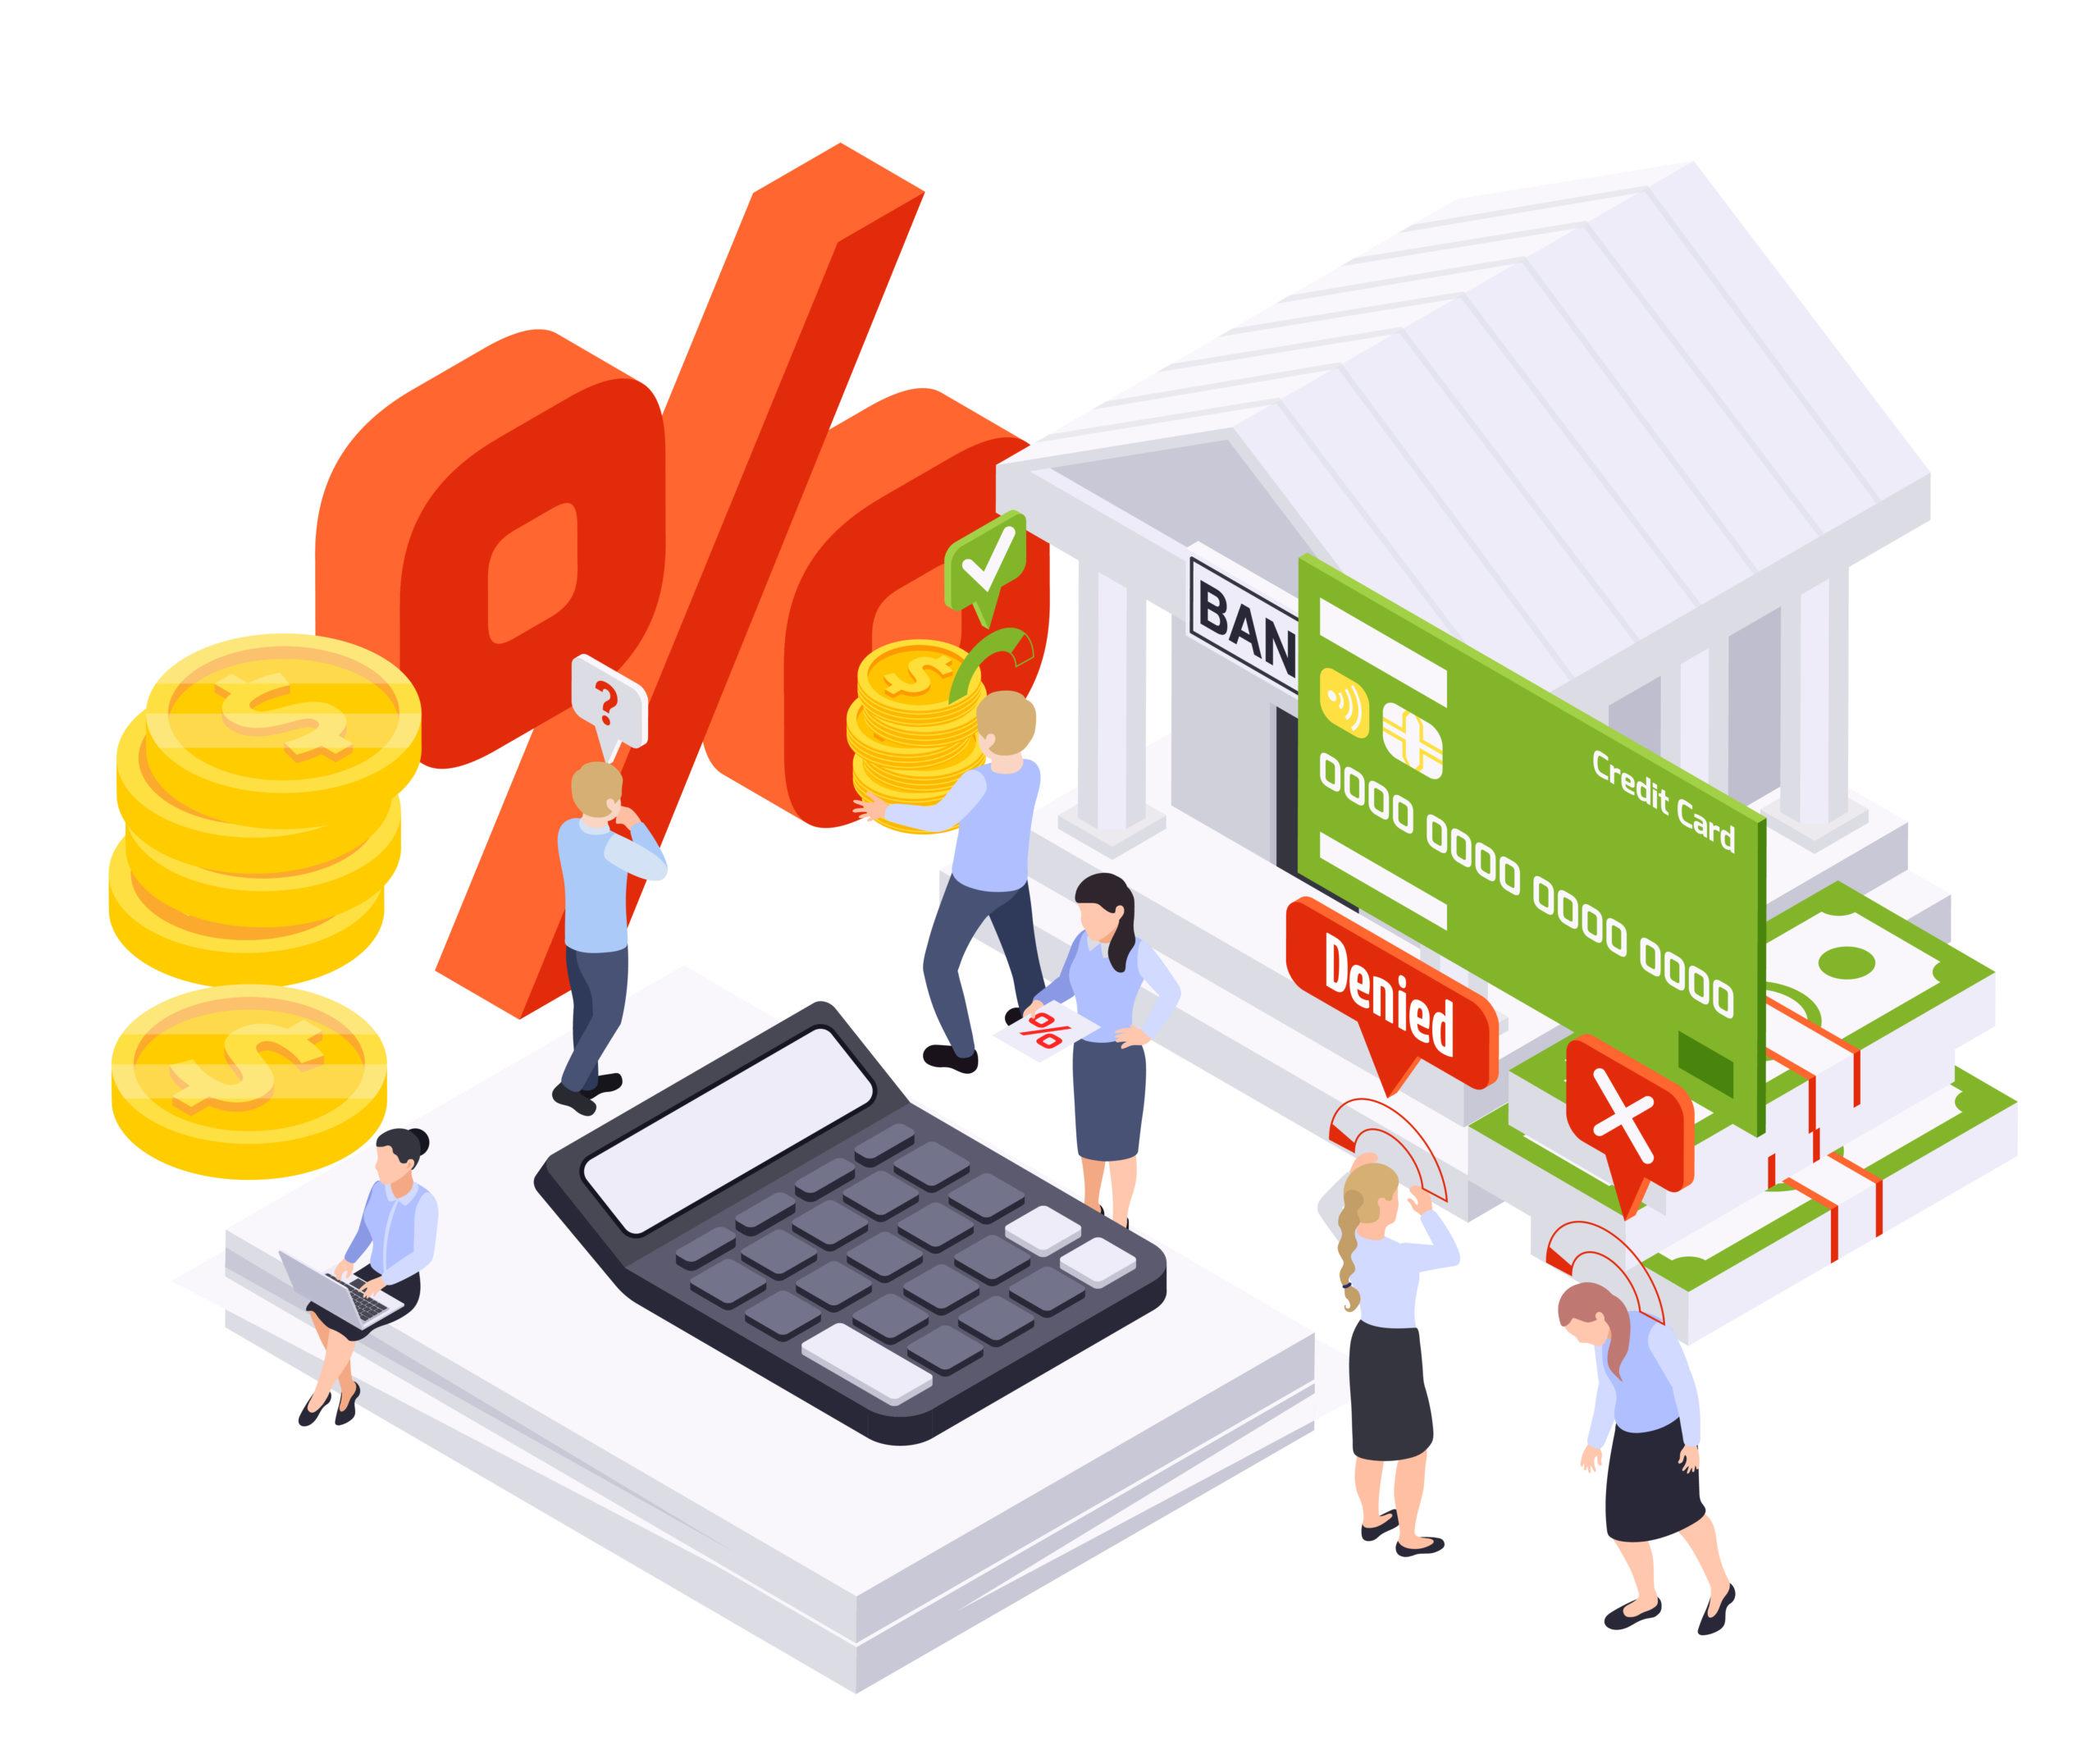 StashFin Personal Loan at Zero Prepayment Fees